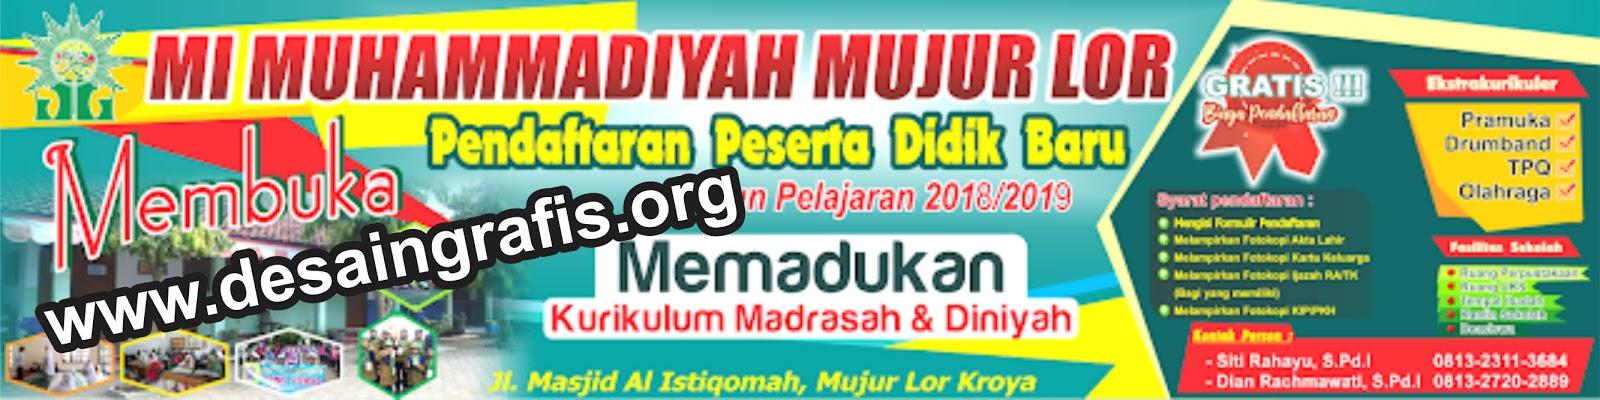 Desain Spanduk Banner PPDB Terbaru 2019/2020 | Kumpulan ...